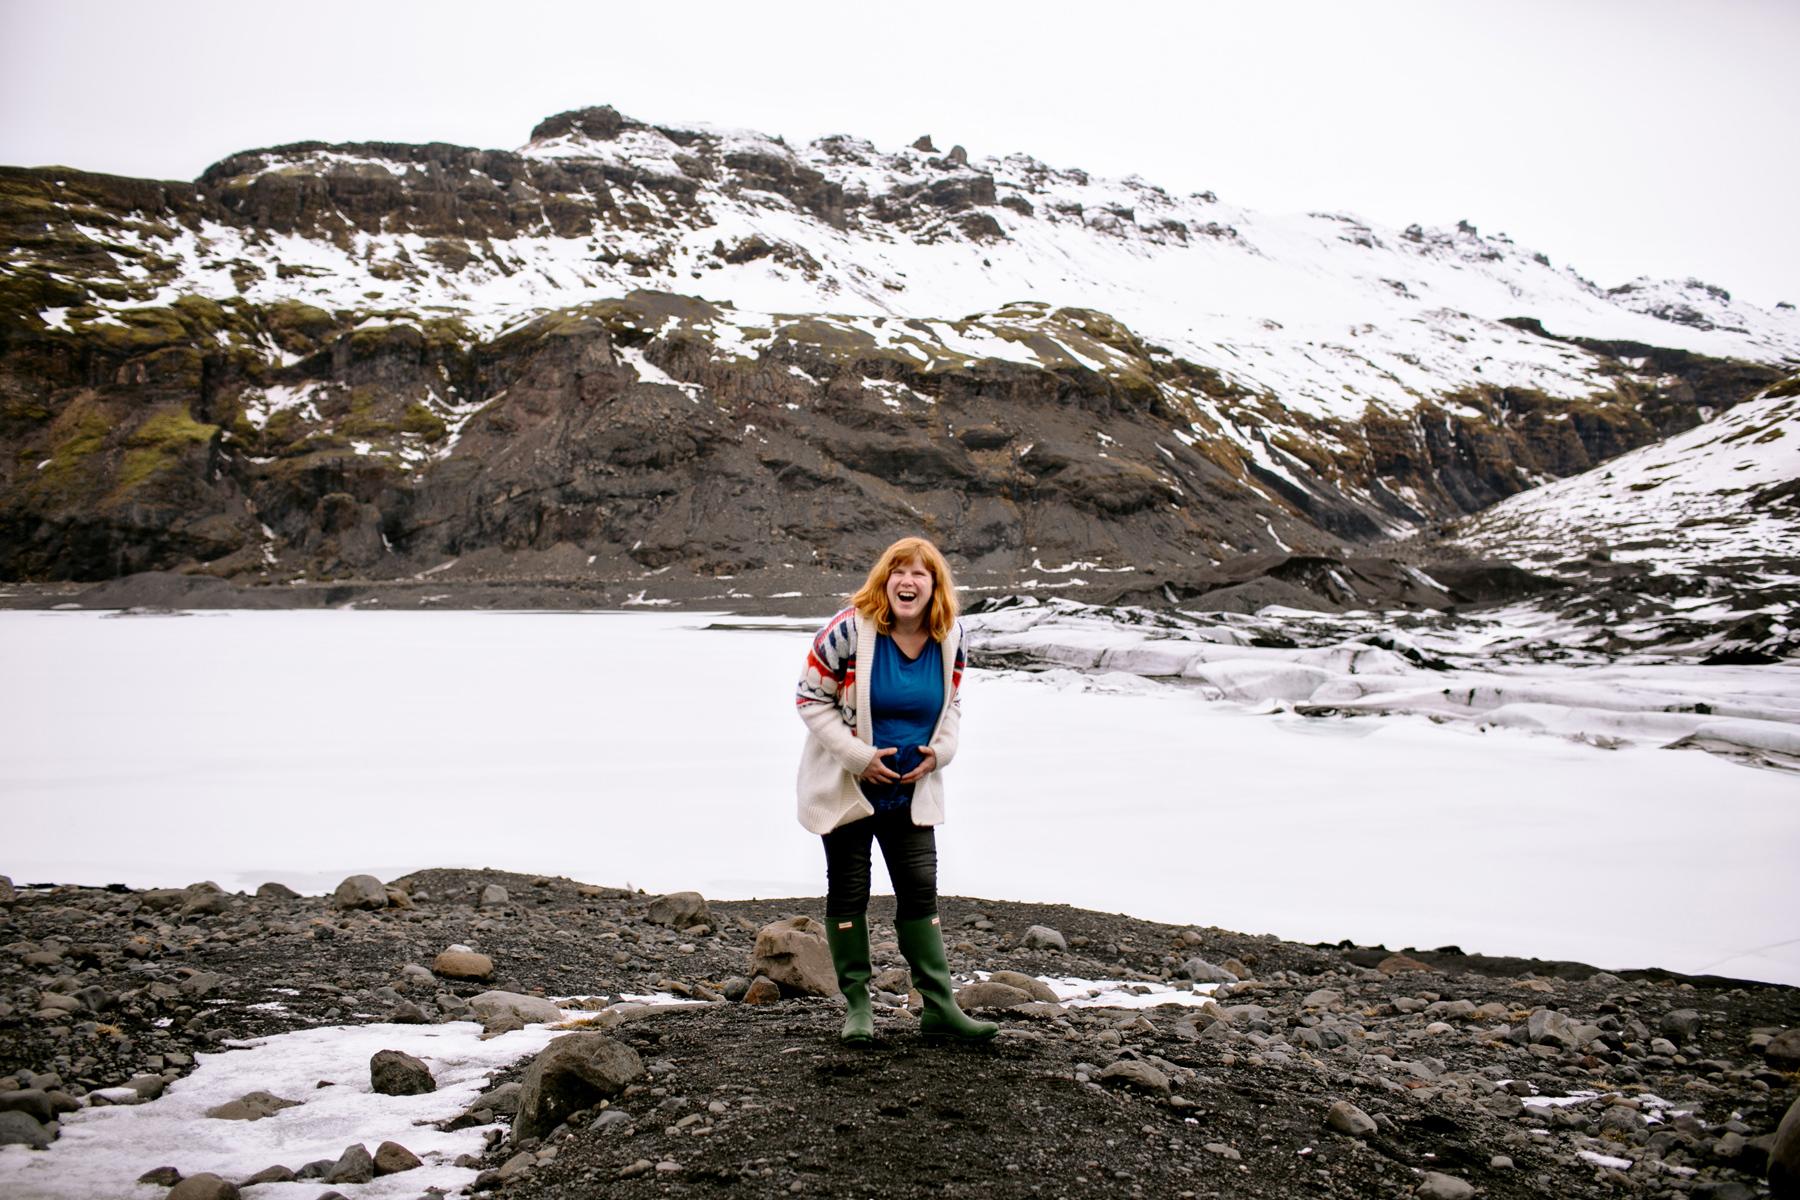 032-epic-iceland-photographer-portraits-kandisebrown-2016